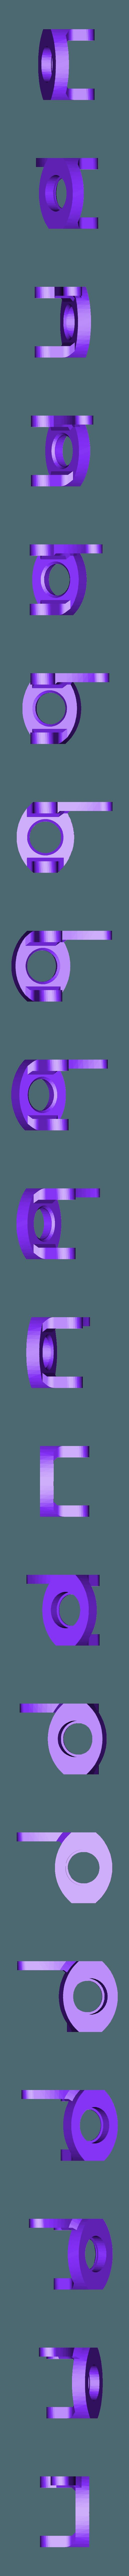 Truck_V4_Axle_Front_Single_Wheelhub1.STL Download STL file 3D Printed Rc Truck V4 • 3D printable template, MrCrankyface